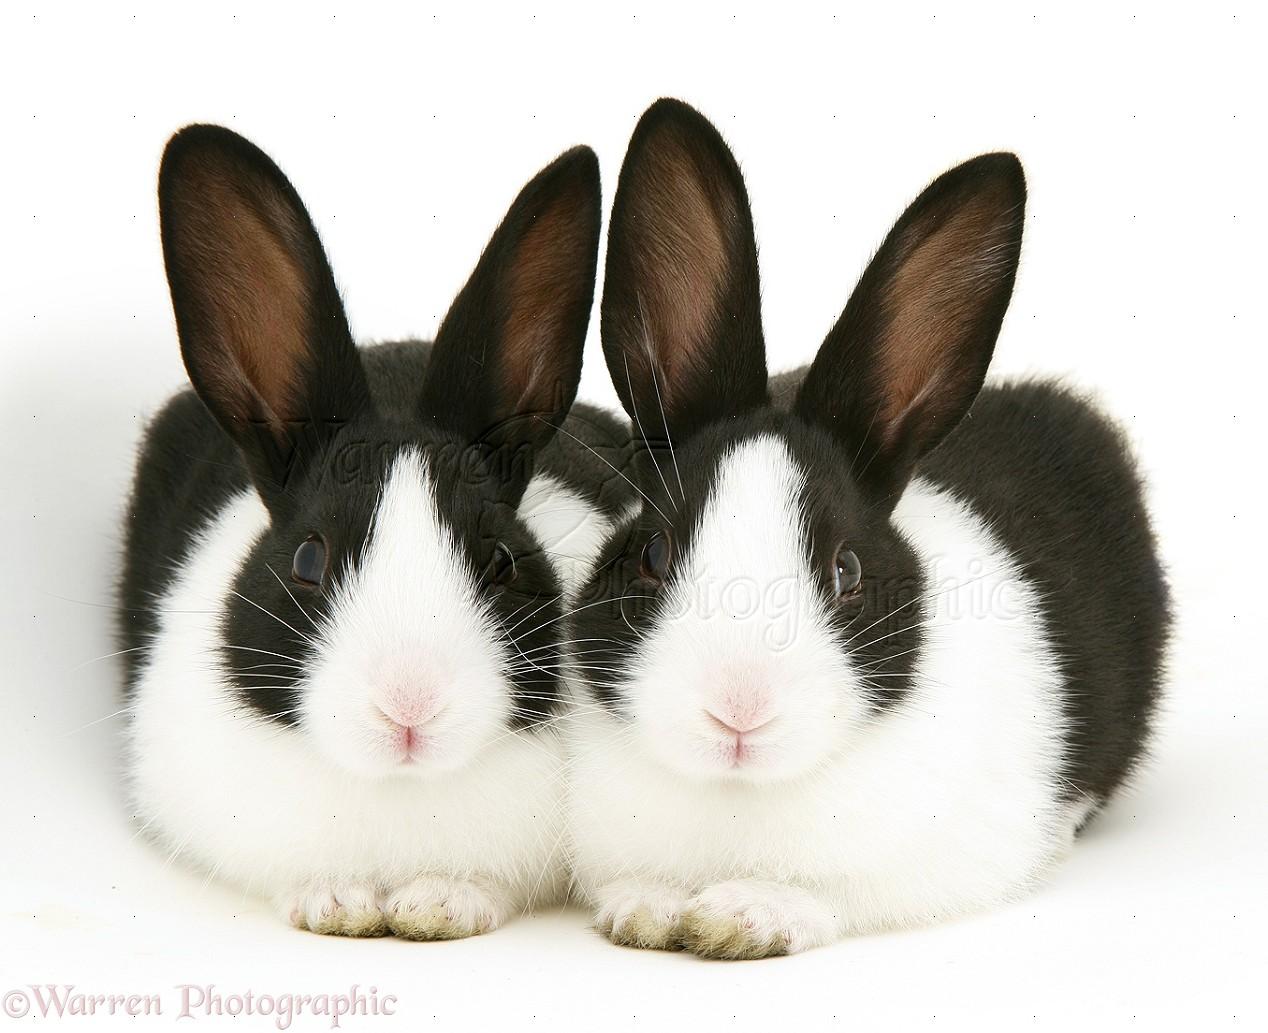 Black-and-white Rabbits Photo WP10109